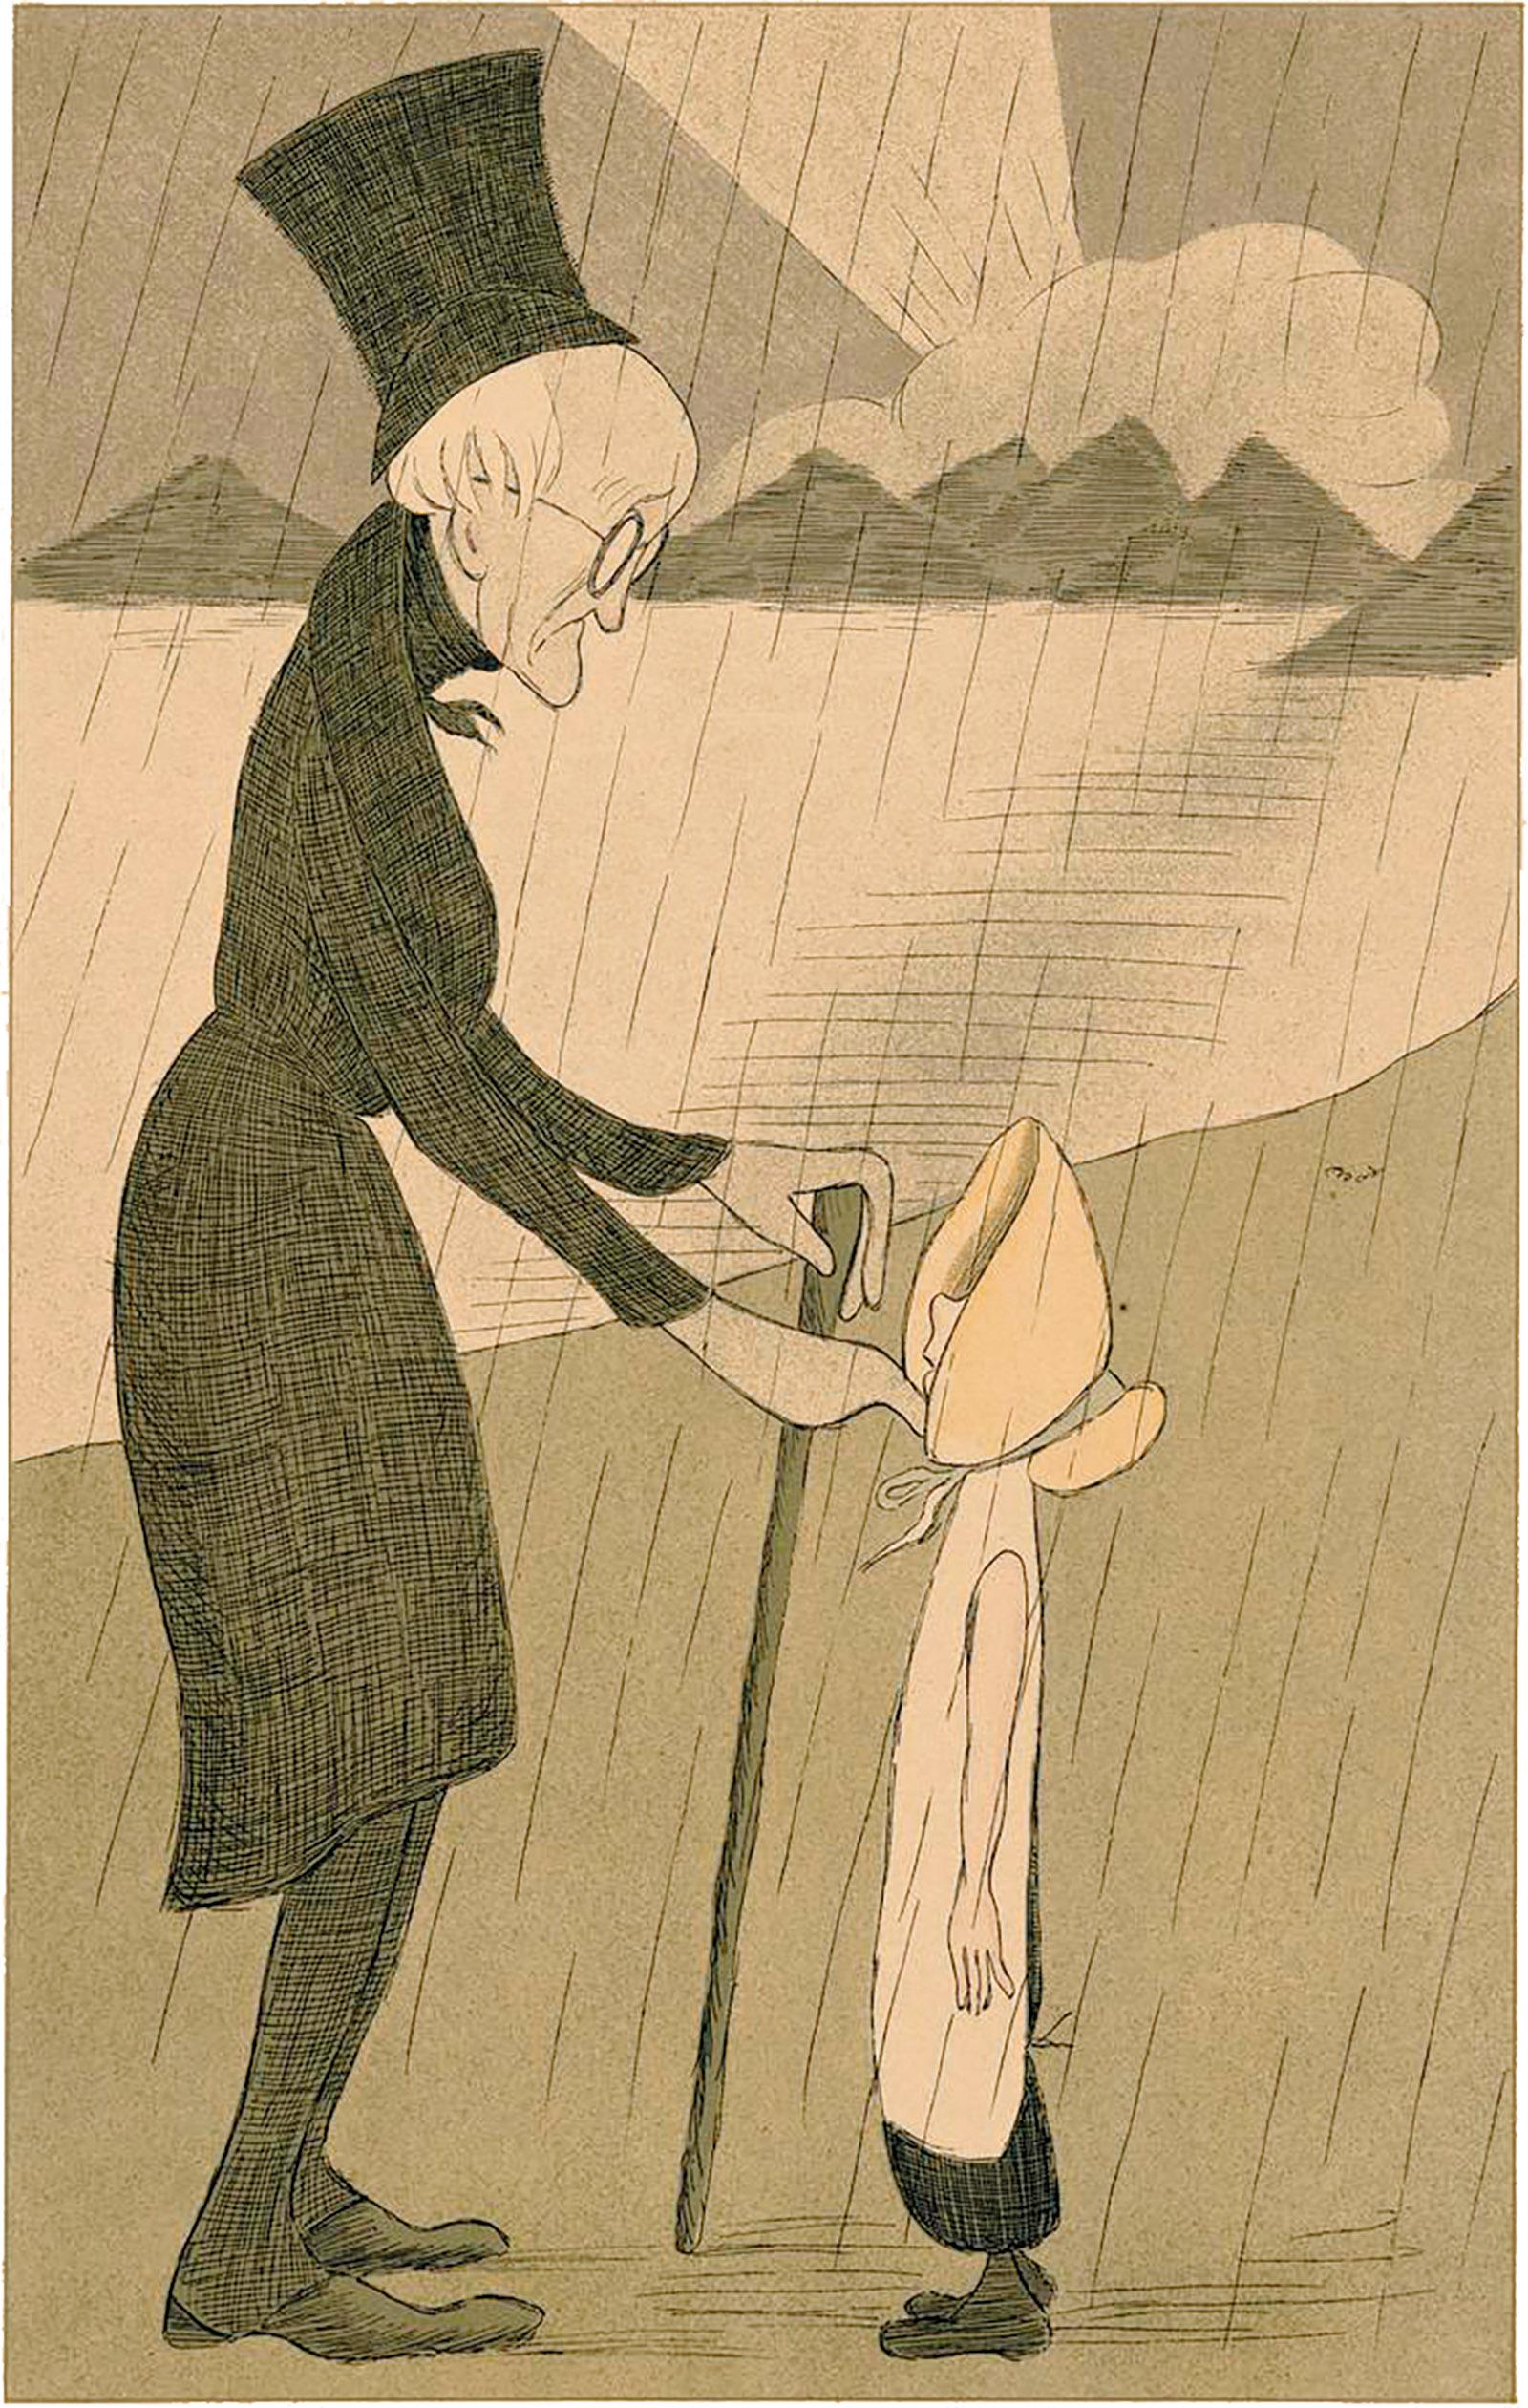 Max Beerbohm: William Wordsworth in the Lake District, at Cross-purposes, 1904